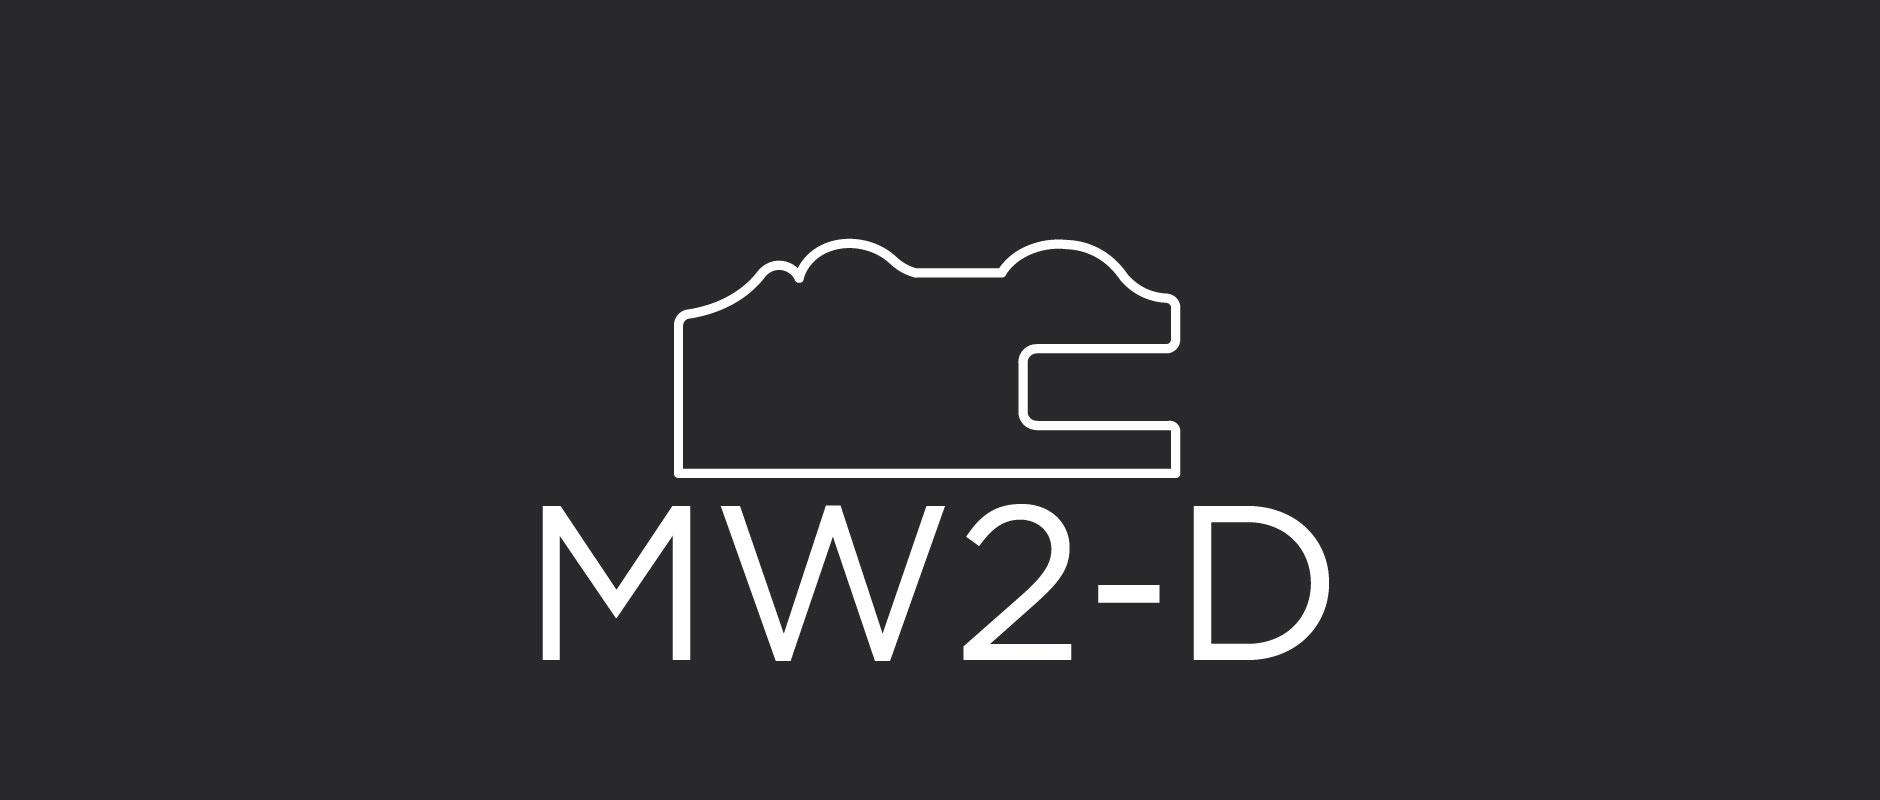 "MW2-D mitered drawer front frame 1-5/8"" wide"